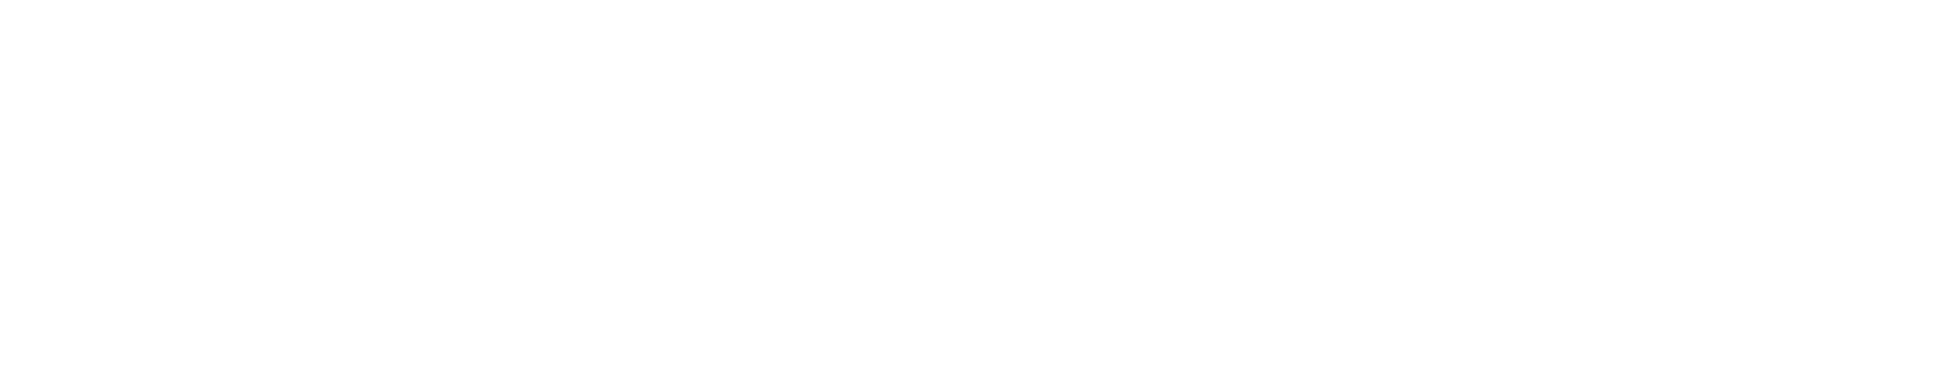 NewsweekLogo.png